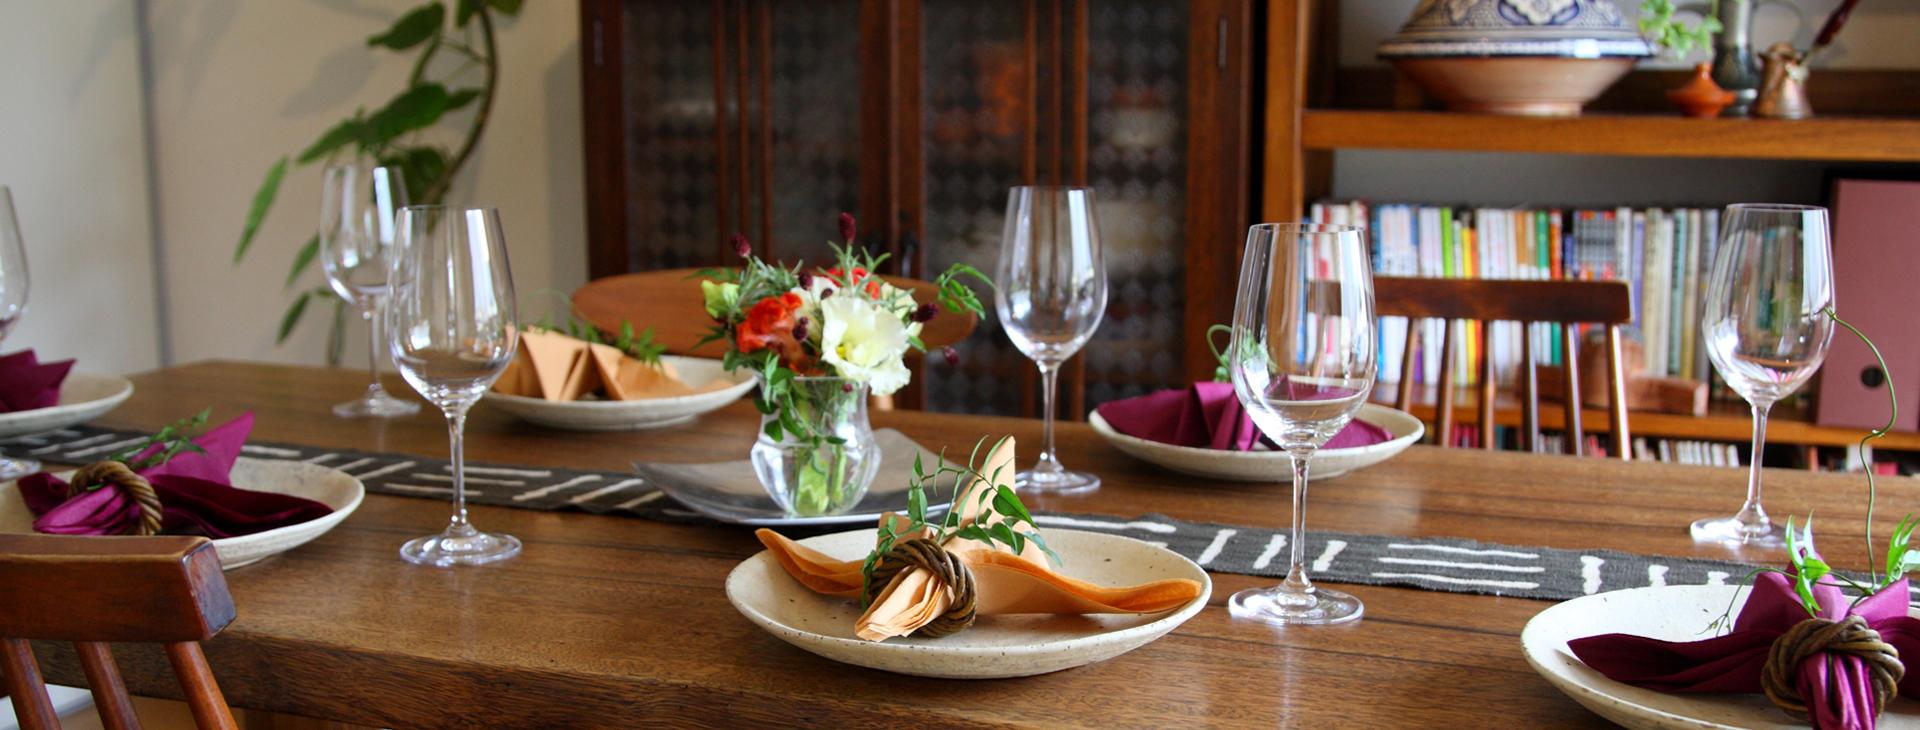 Wakka Kitchen : 佐藤わか子の自宅で学ぶ各国料理教室